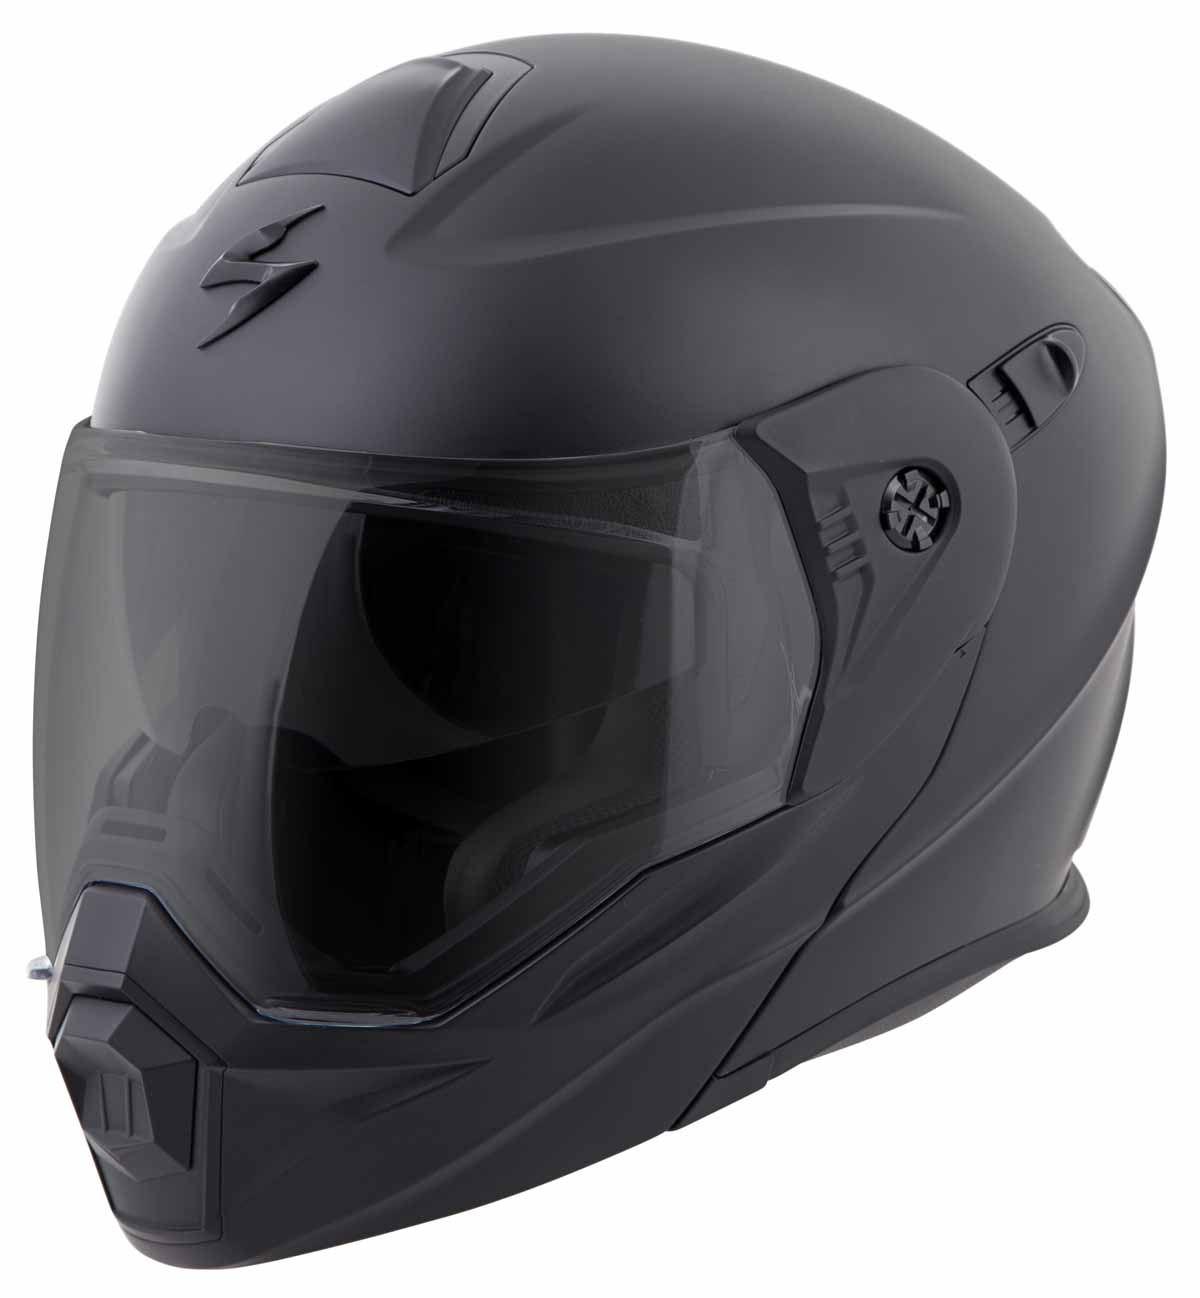 Scorpion-EXO-AT950-Helmet-Flip-Up-Modular-Dual-Sport-Adventure-ADV-DOT-XS-3XL miniature 8